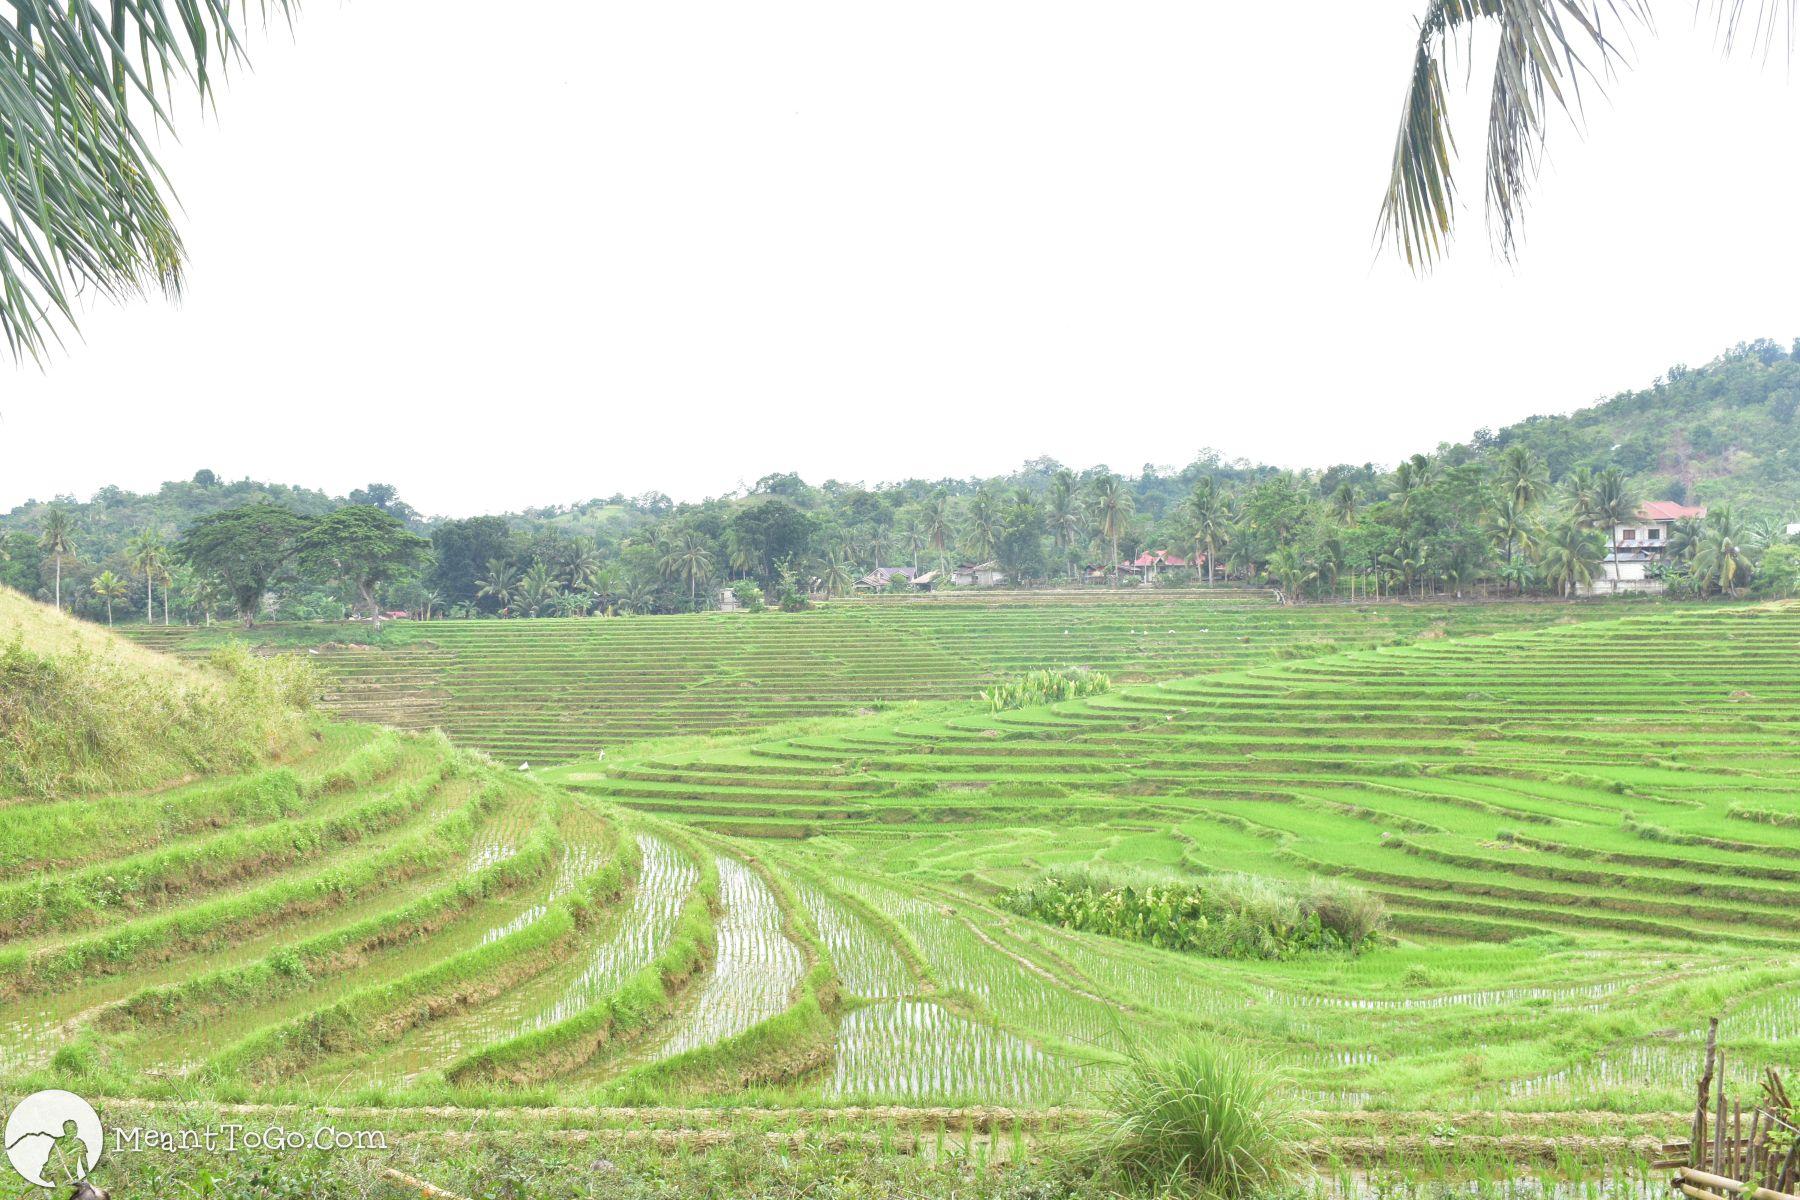 Cadapdapan Rice Terraces, Candijay, Bohol, Philippines